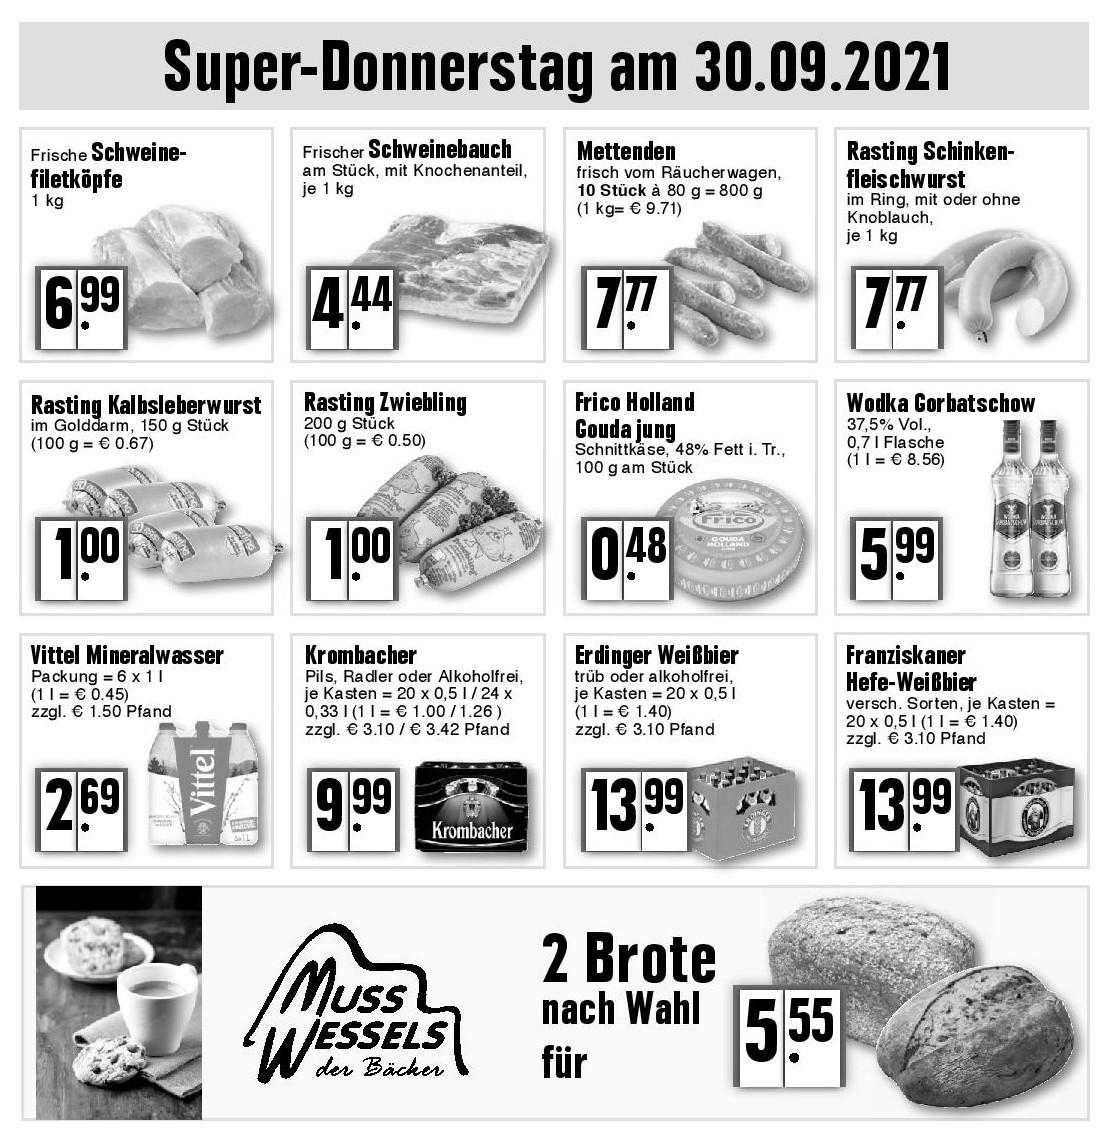 Super Donnerstag am 30.09.2021